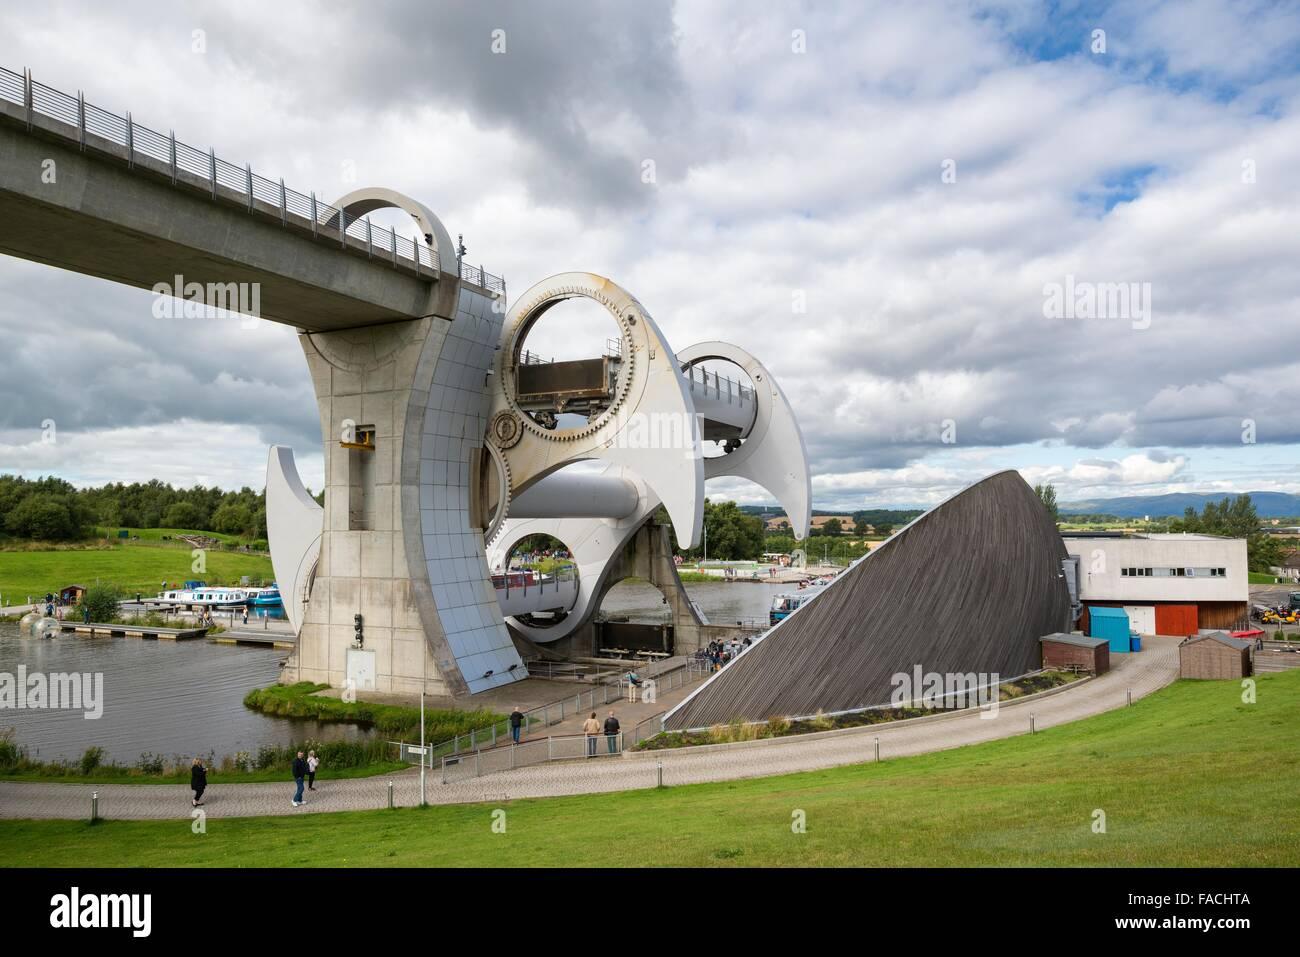 Falkirk Wheel, rotating boat lift, Falkirk, Scotland, United Kingdom - Stock Image